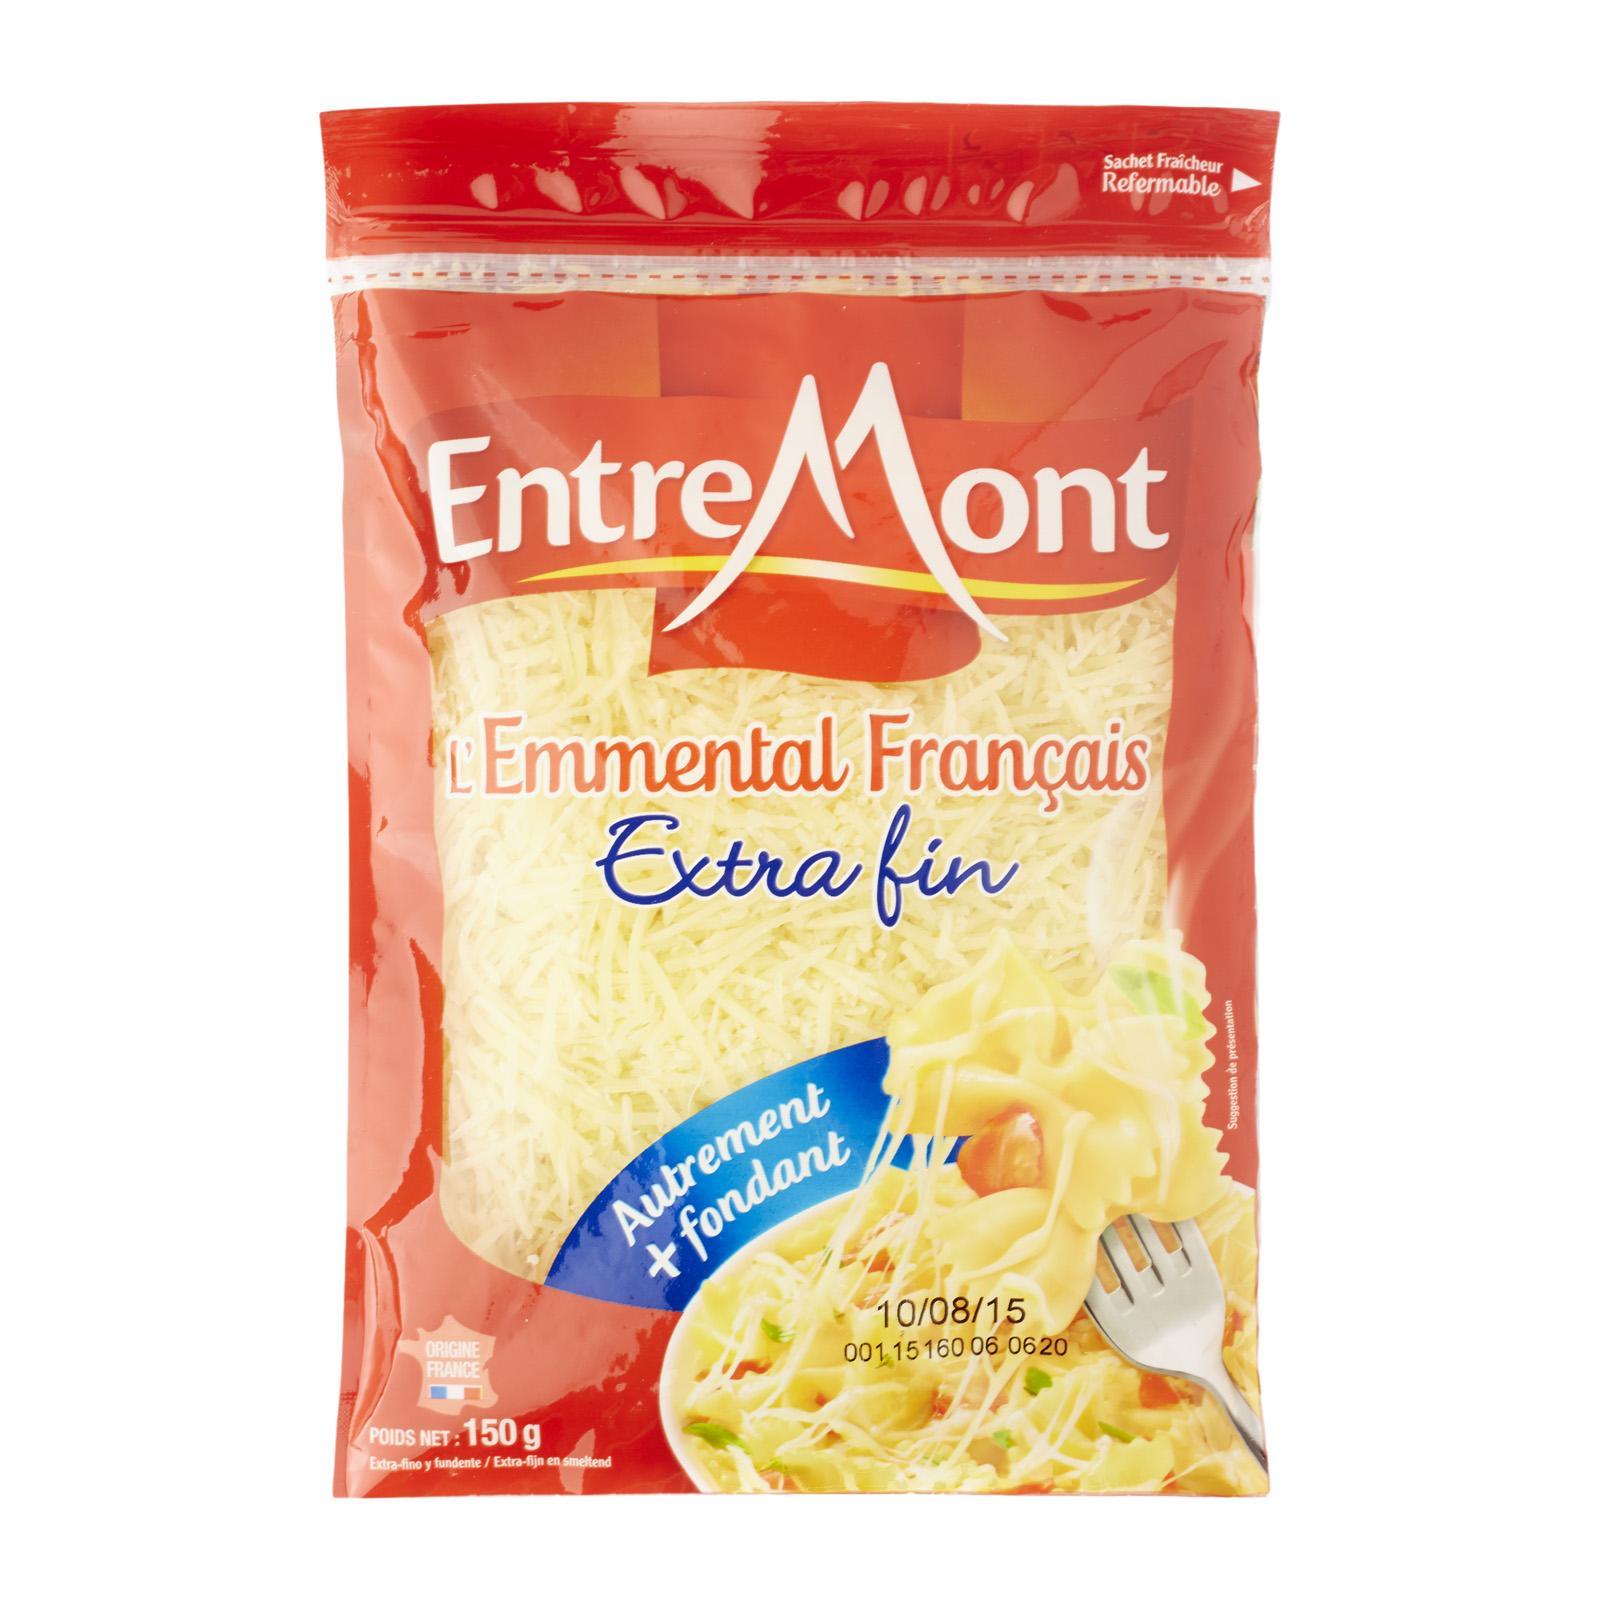 Entremont Emmental Shredded Cheese